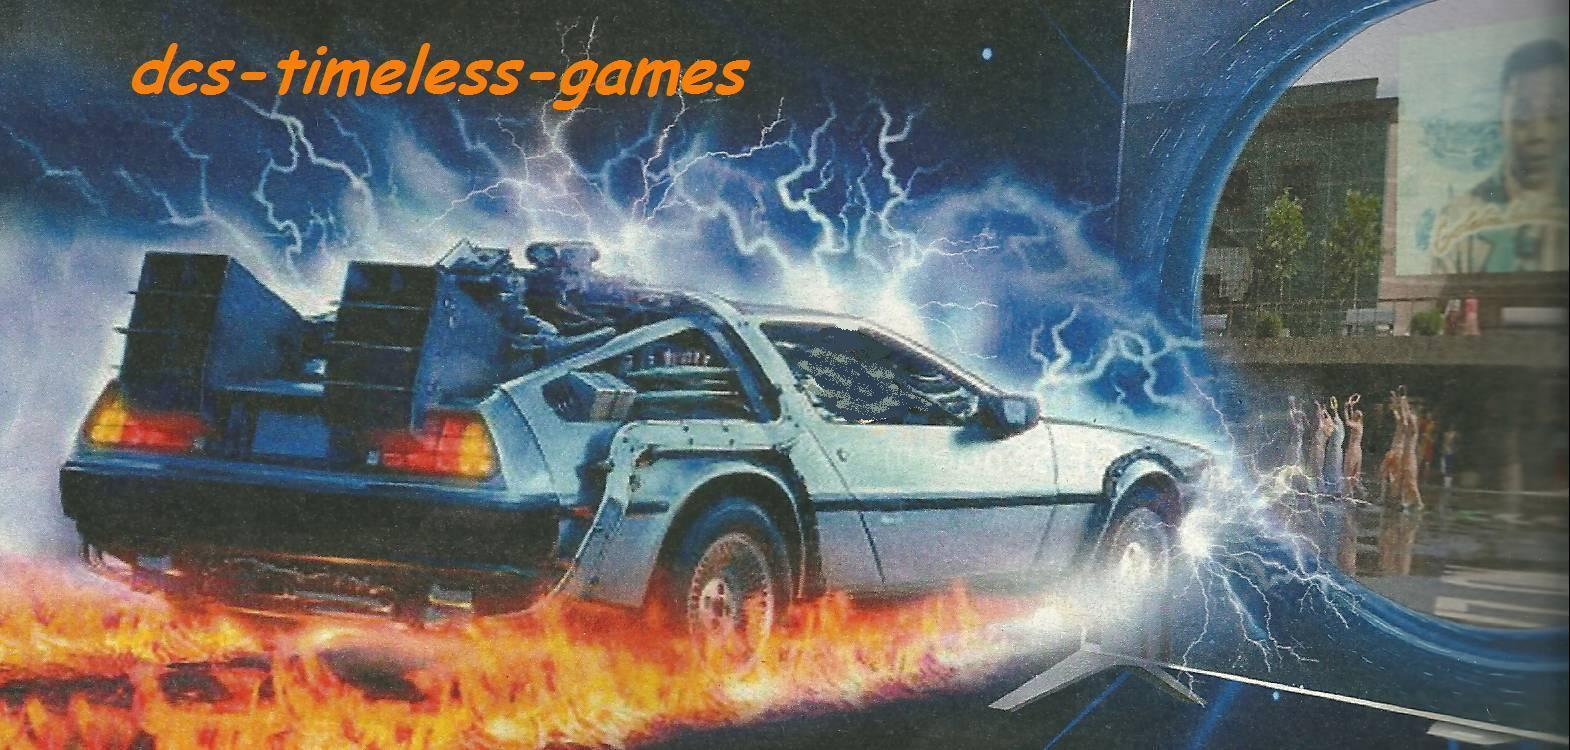 dcs-timeless-games